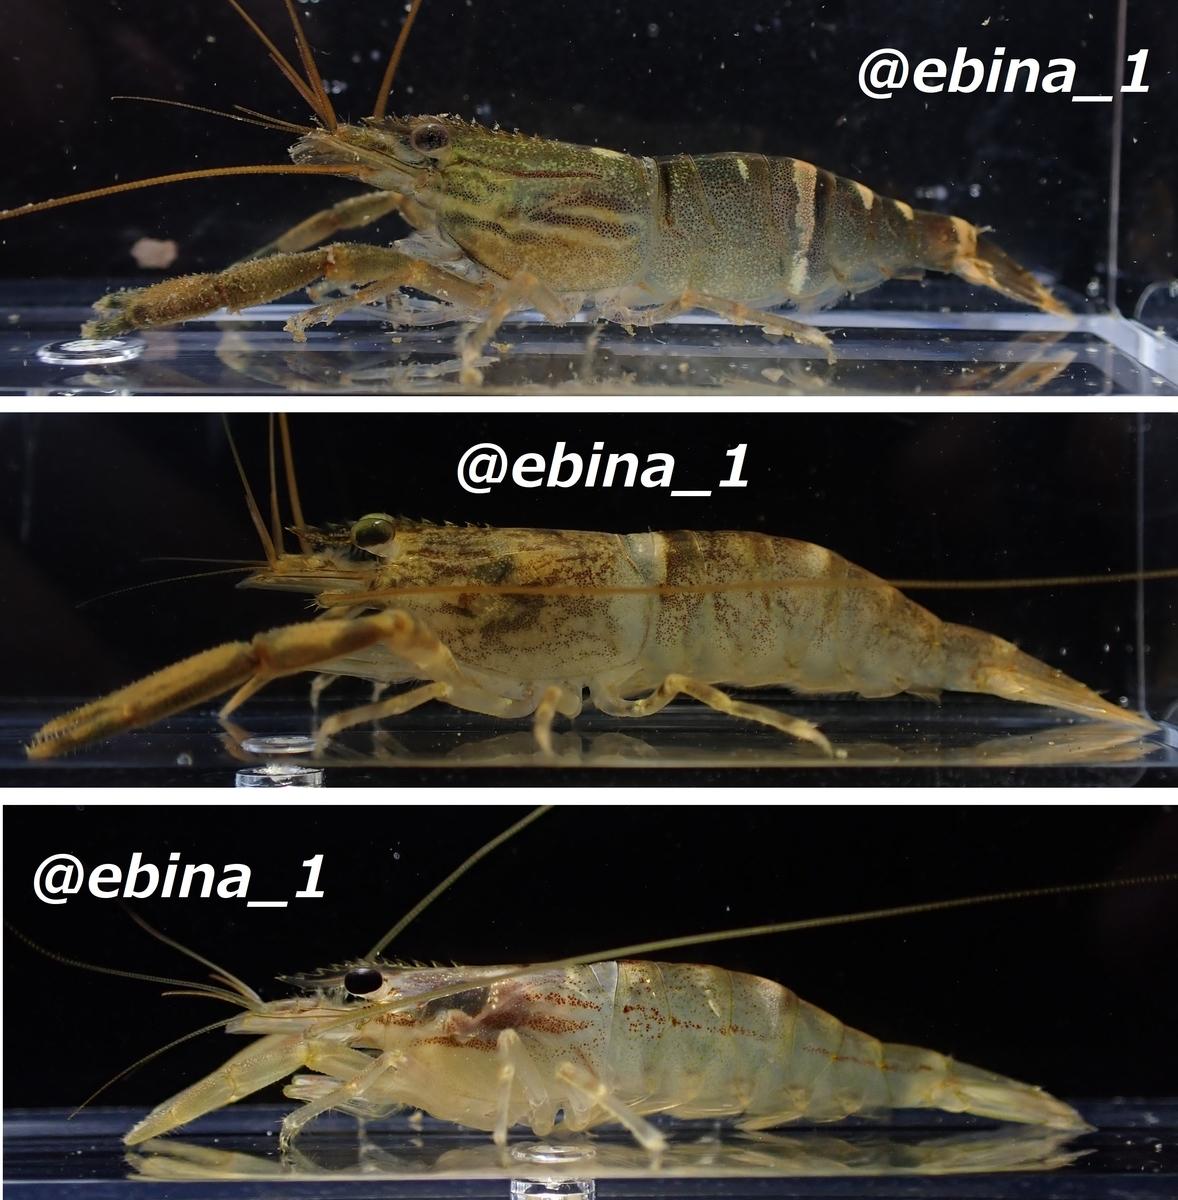 f:id:ebina-1:20210511203046j:plain